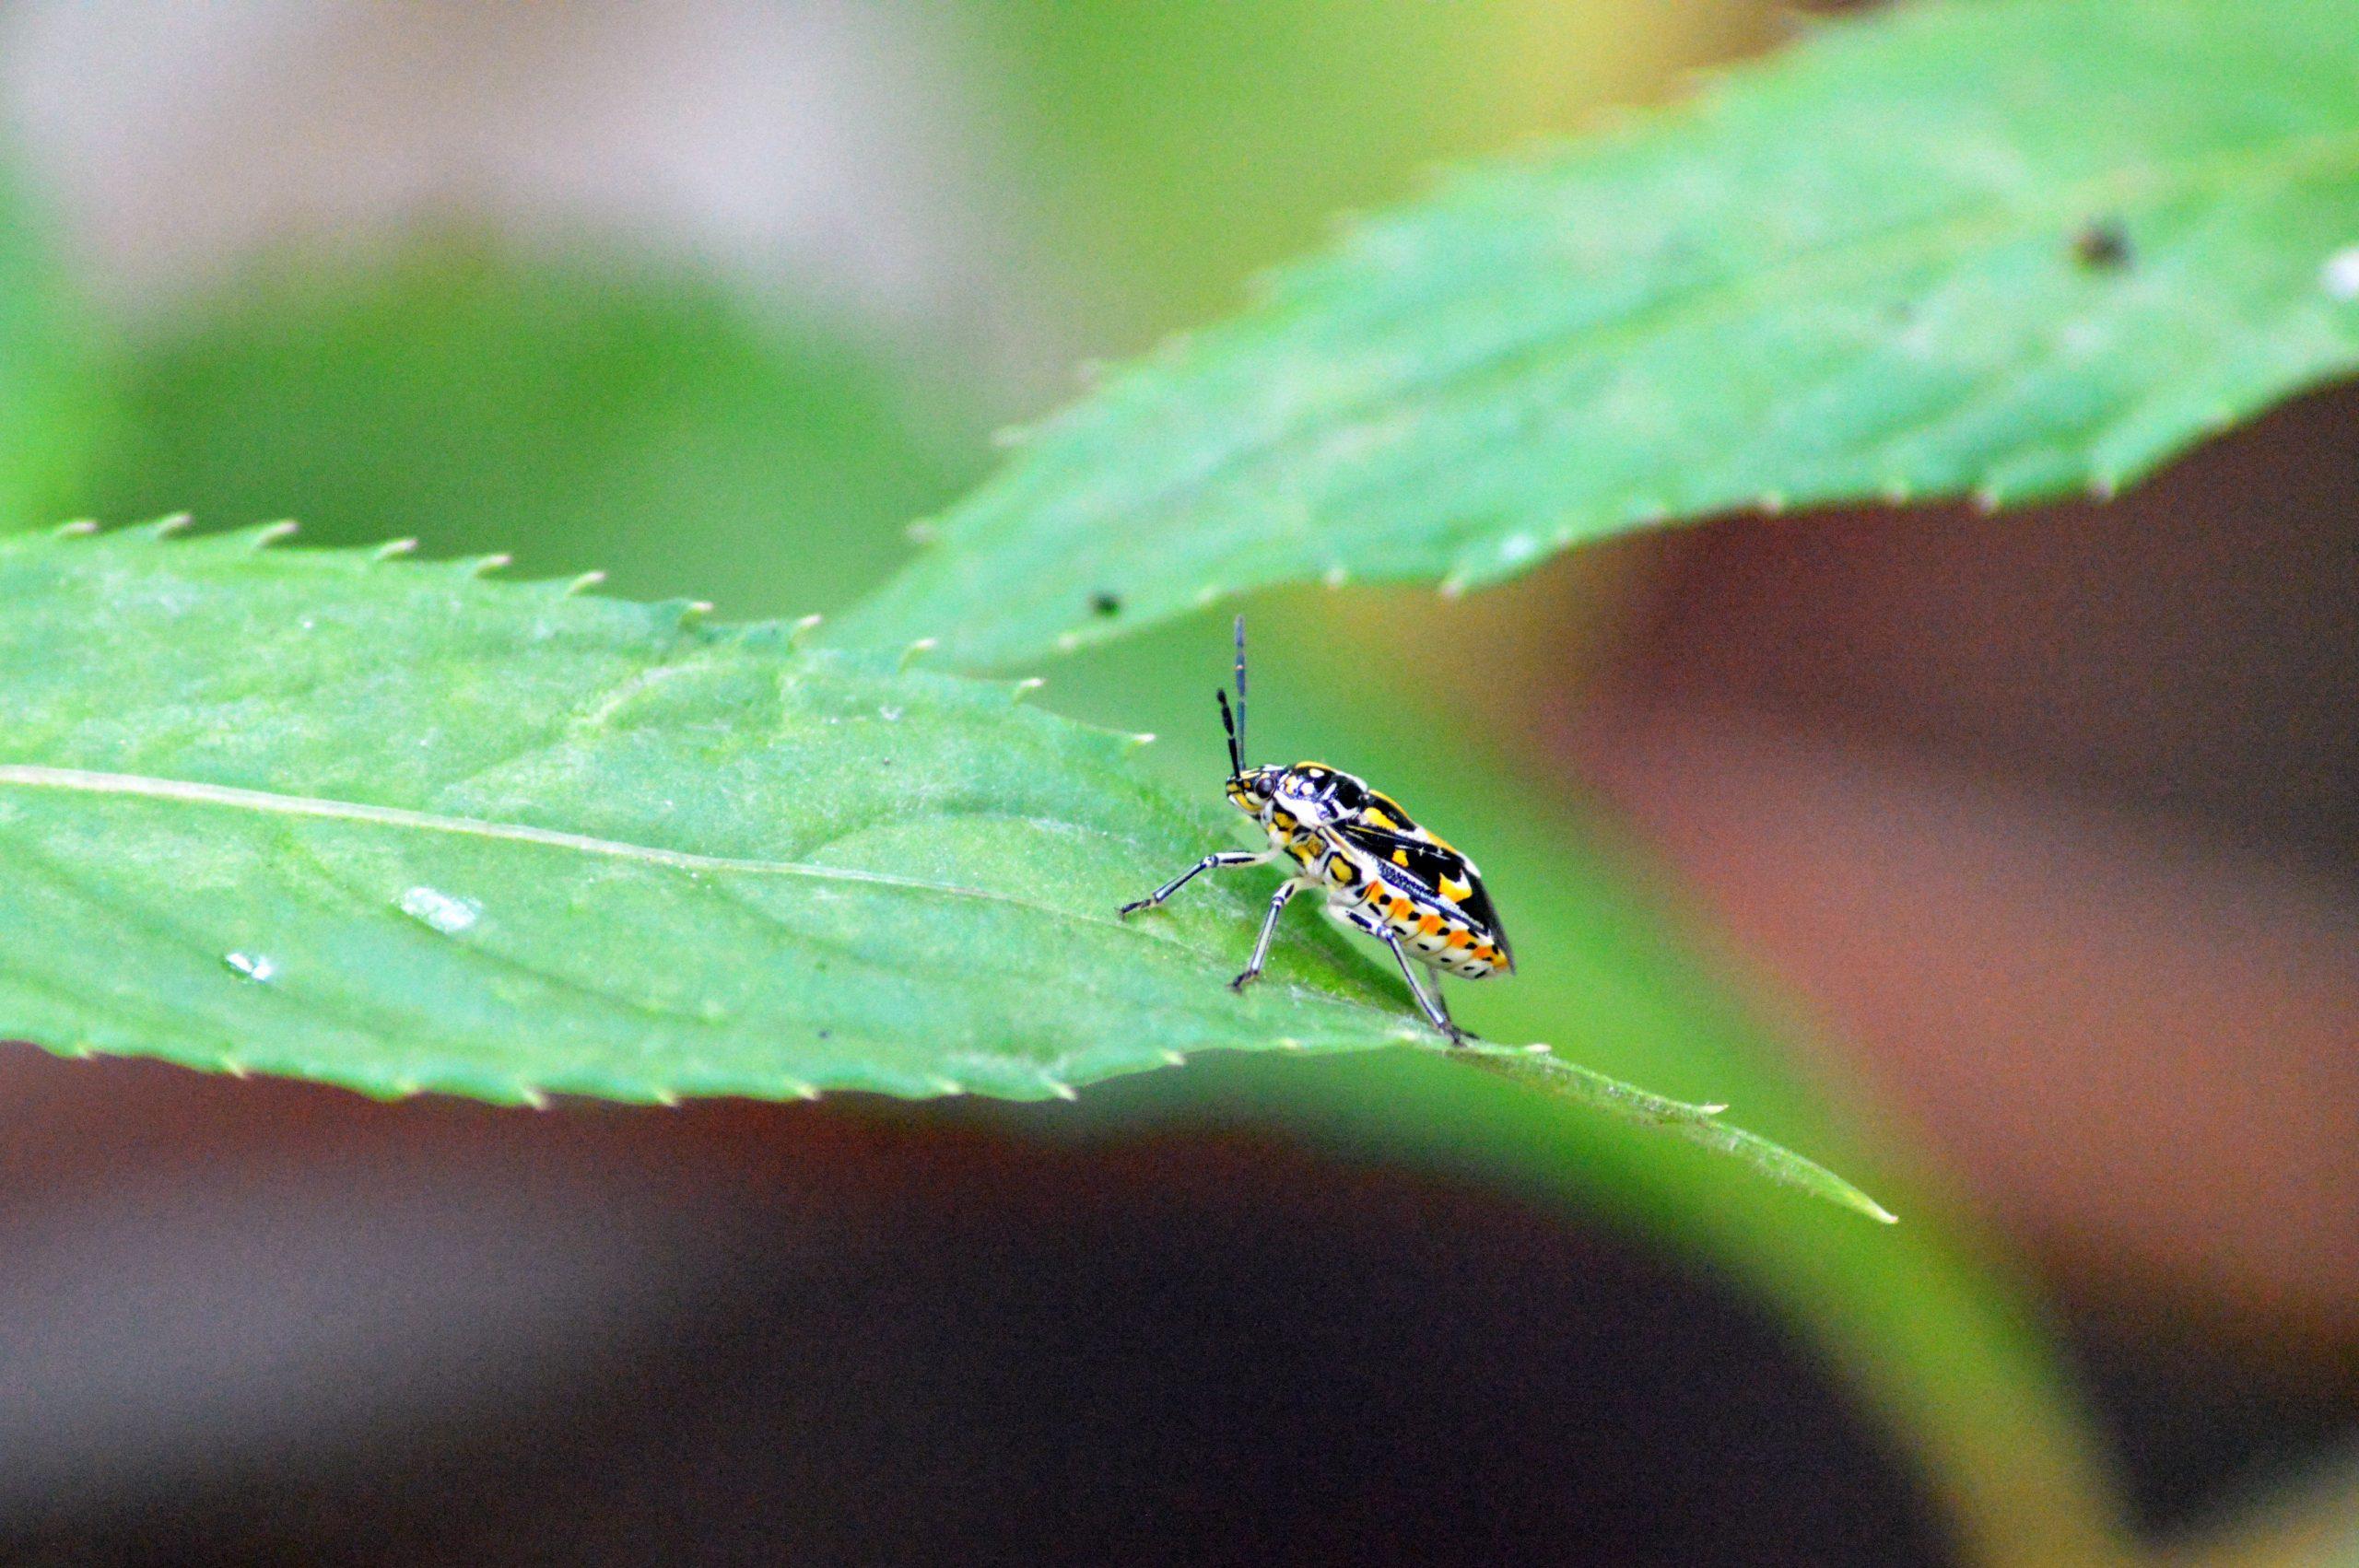 Bug on plant leaf